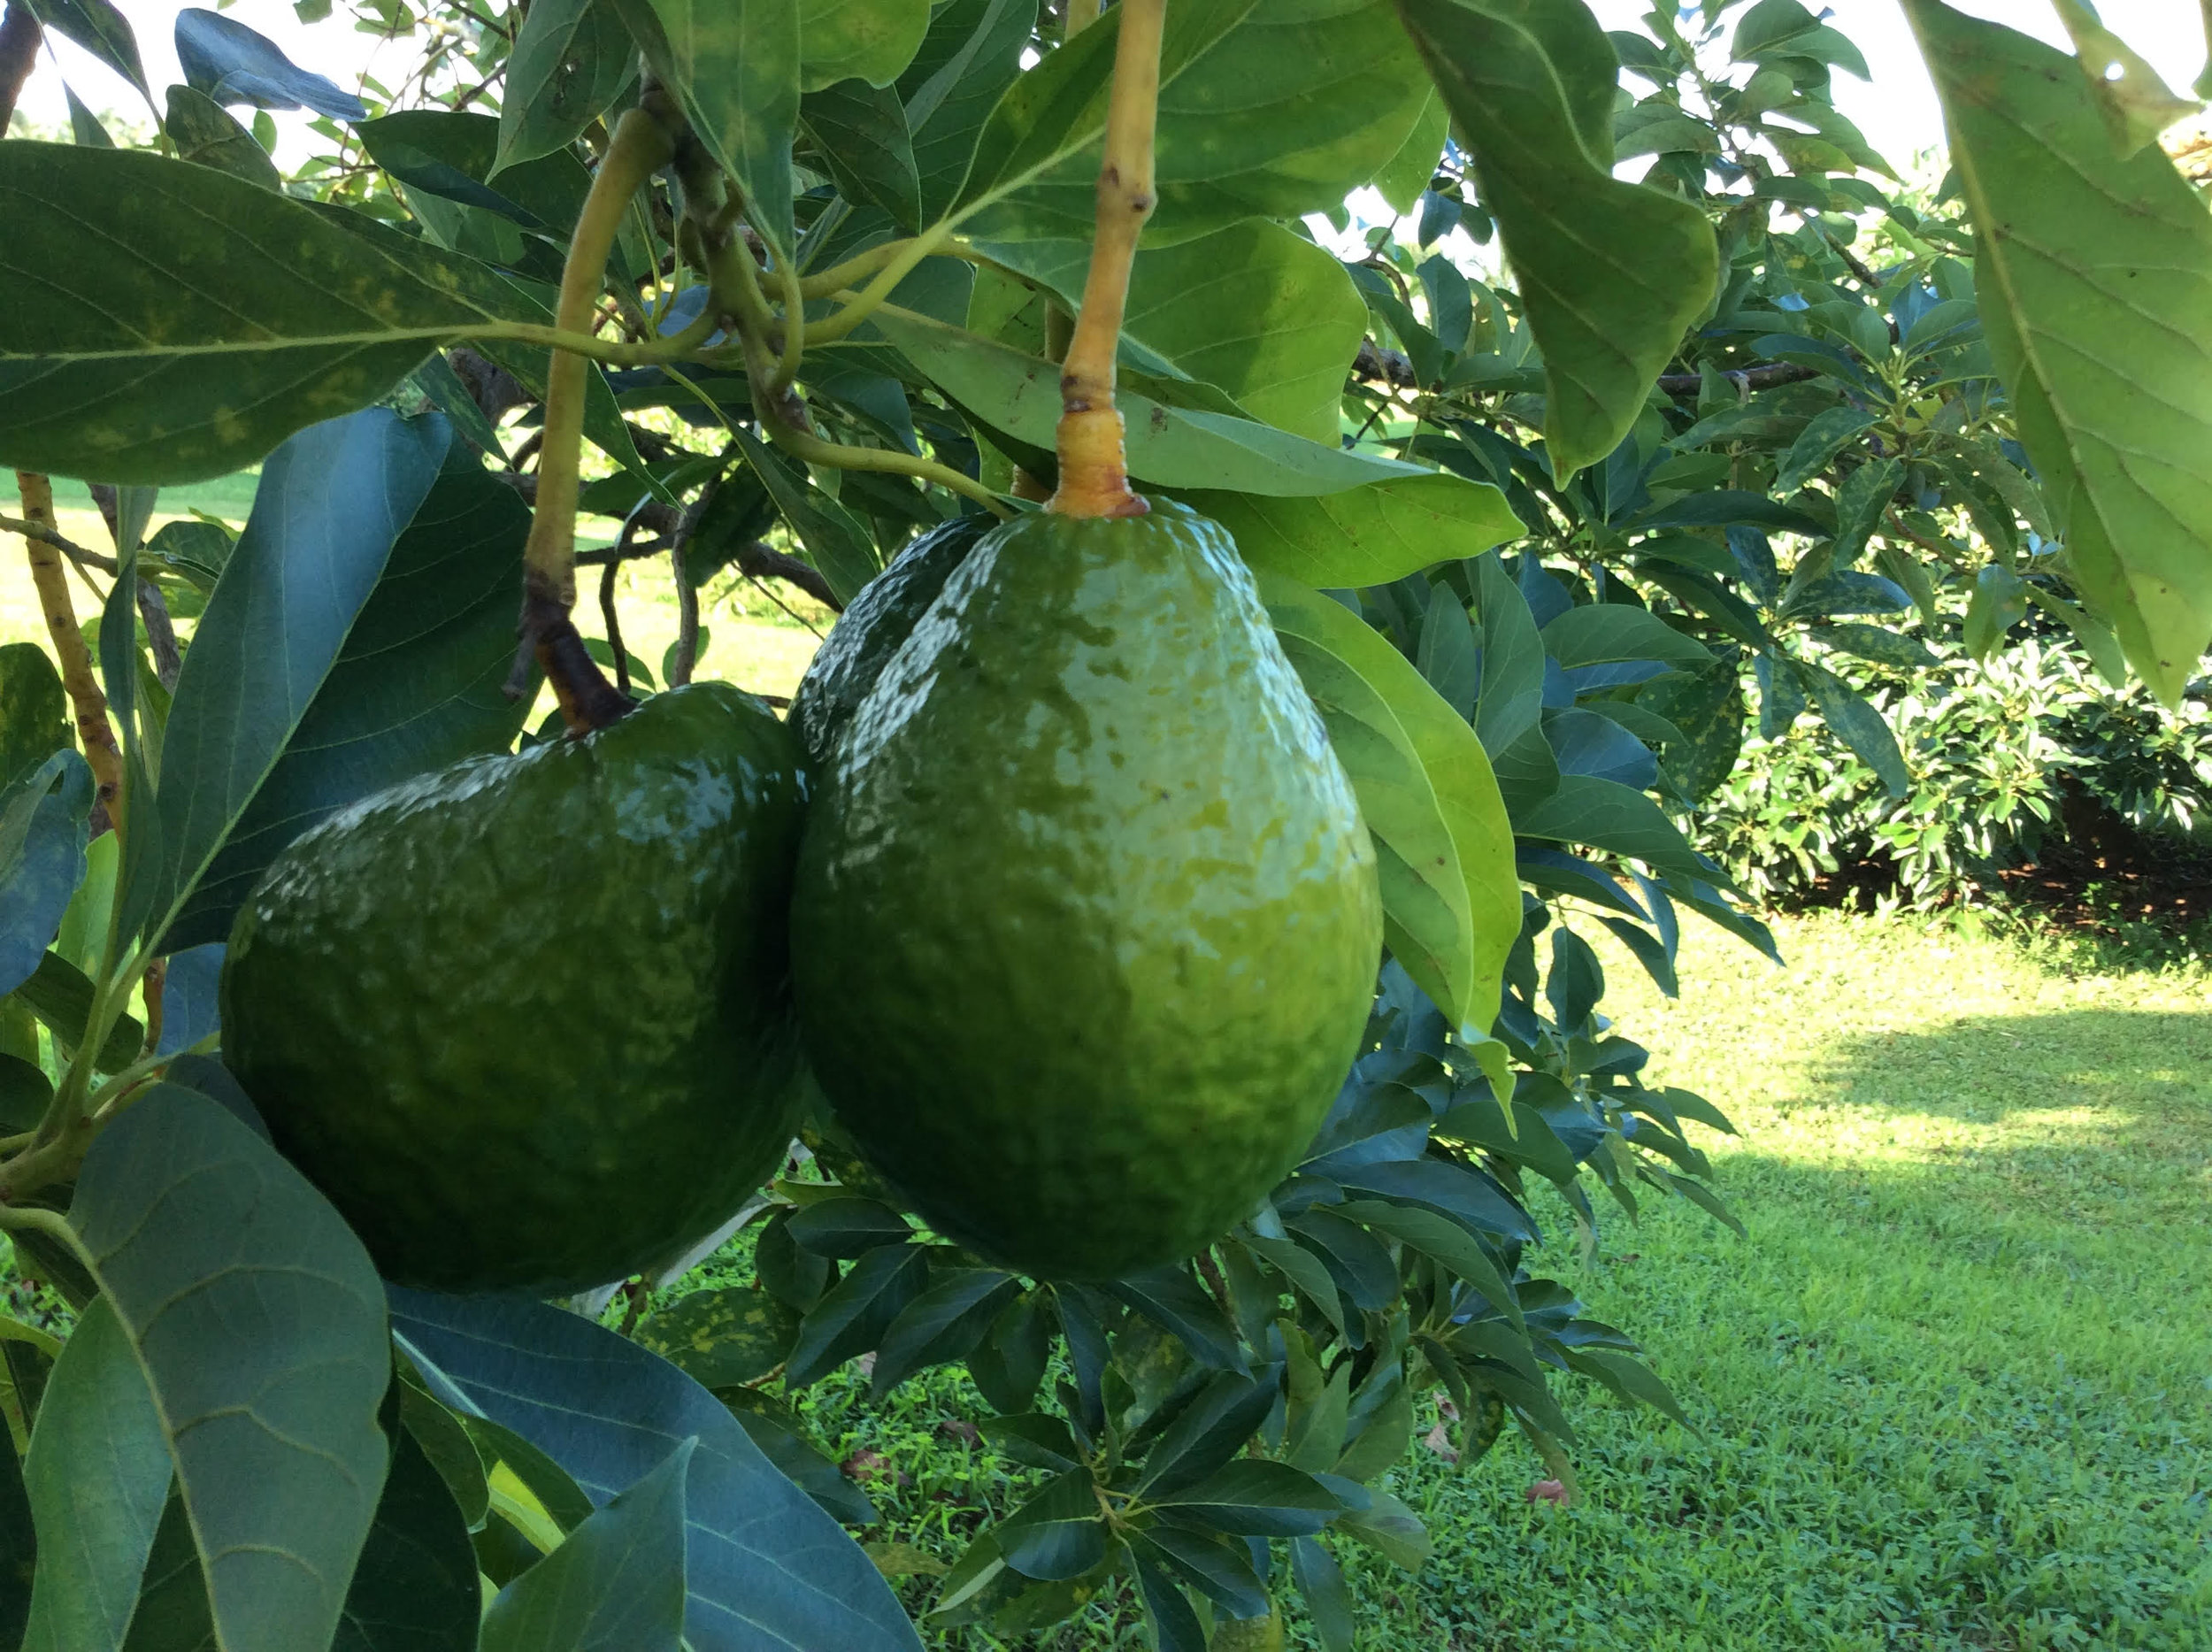 Grow Avocado - https://www.youtube.com/watch?v=-_JDyqskGxE